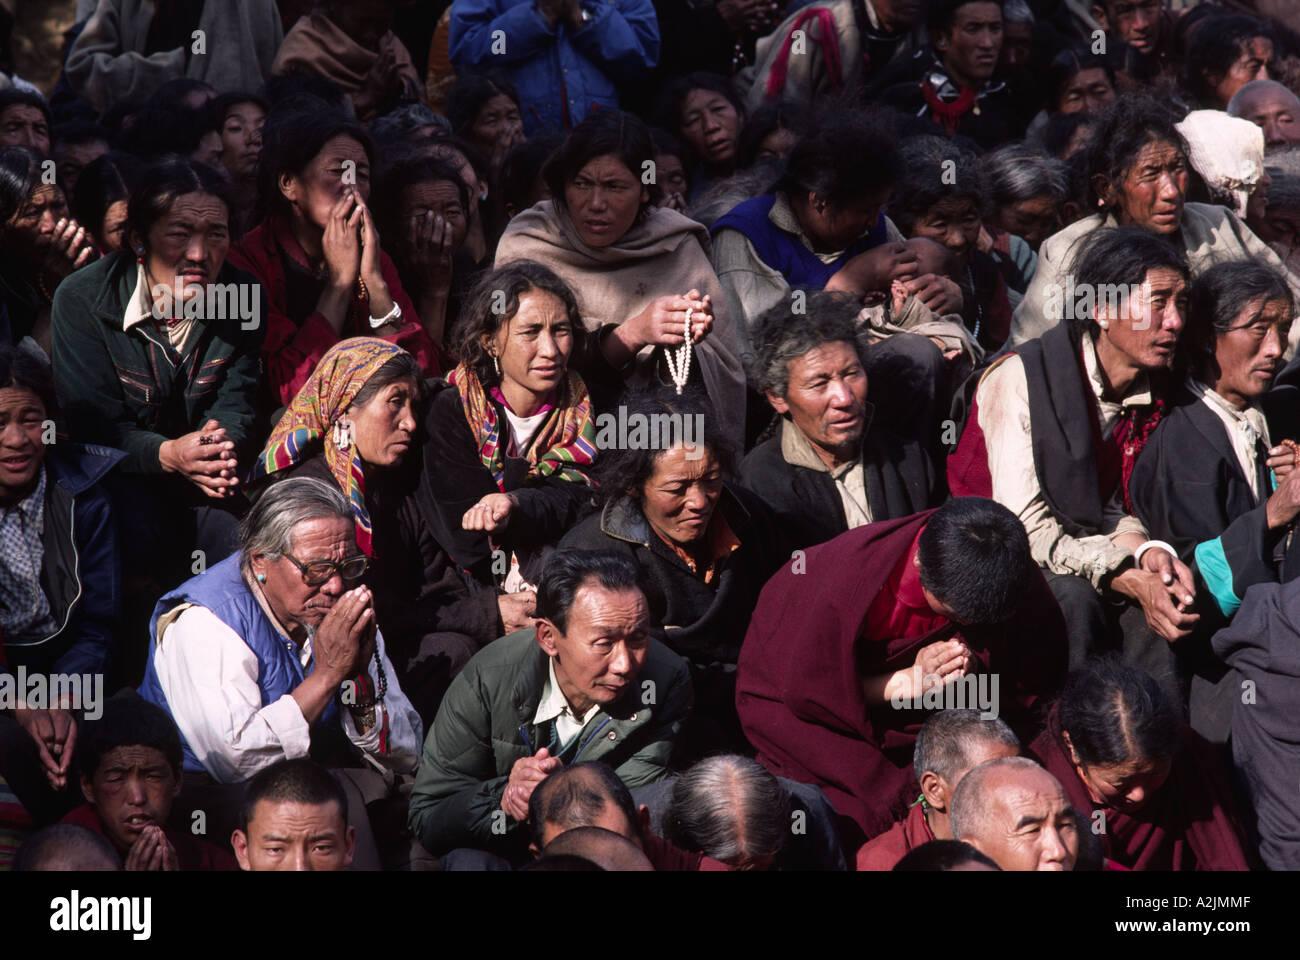 Pilgrims from the Himalaya listening to the Dalai Lama. India - Stock Image